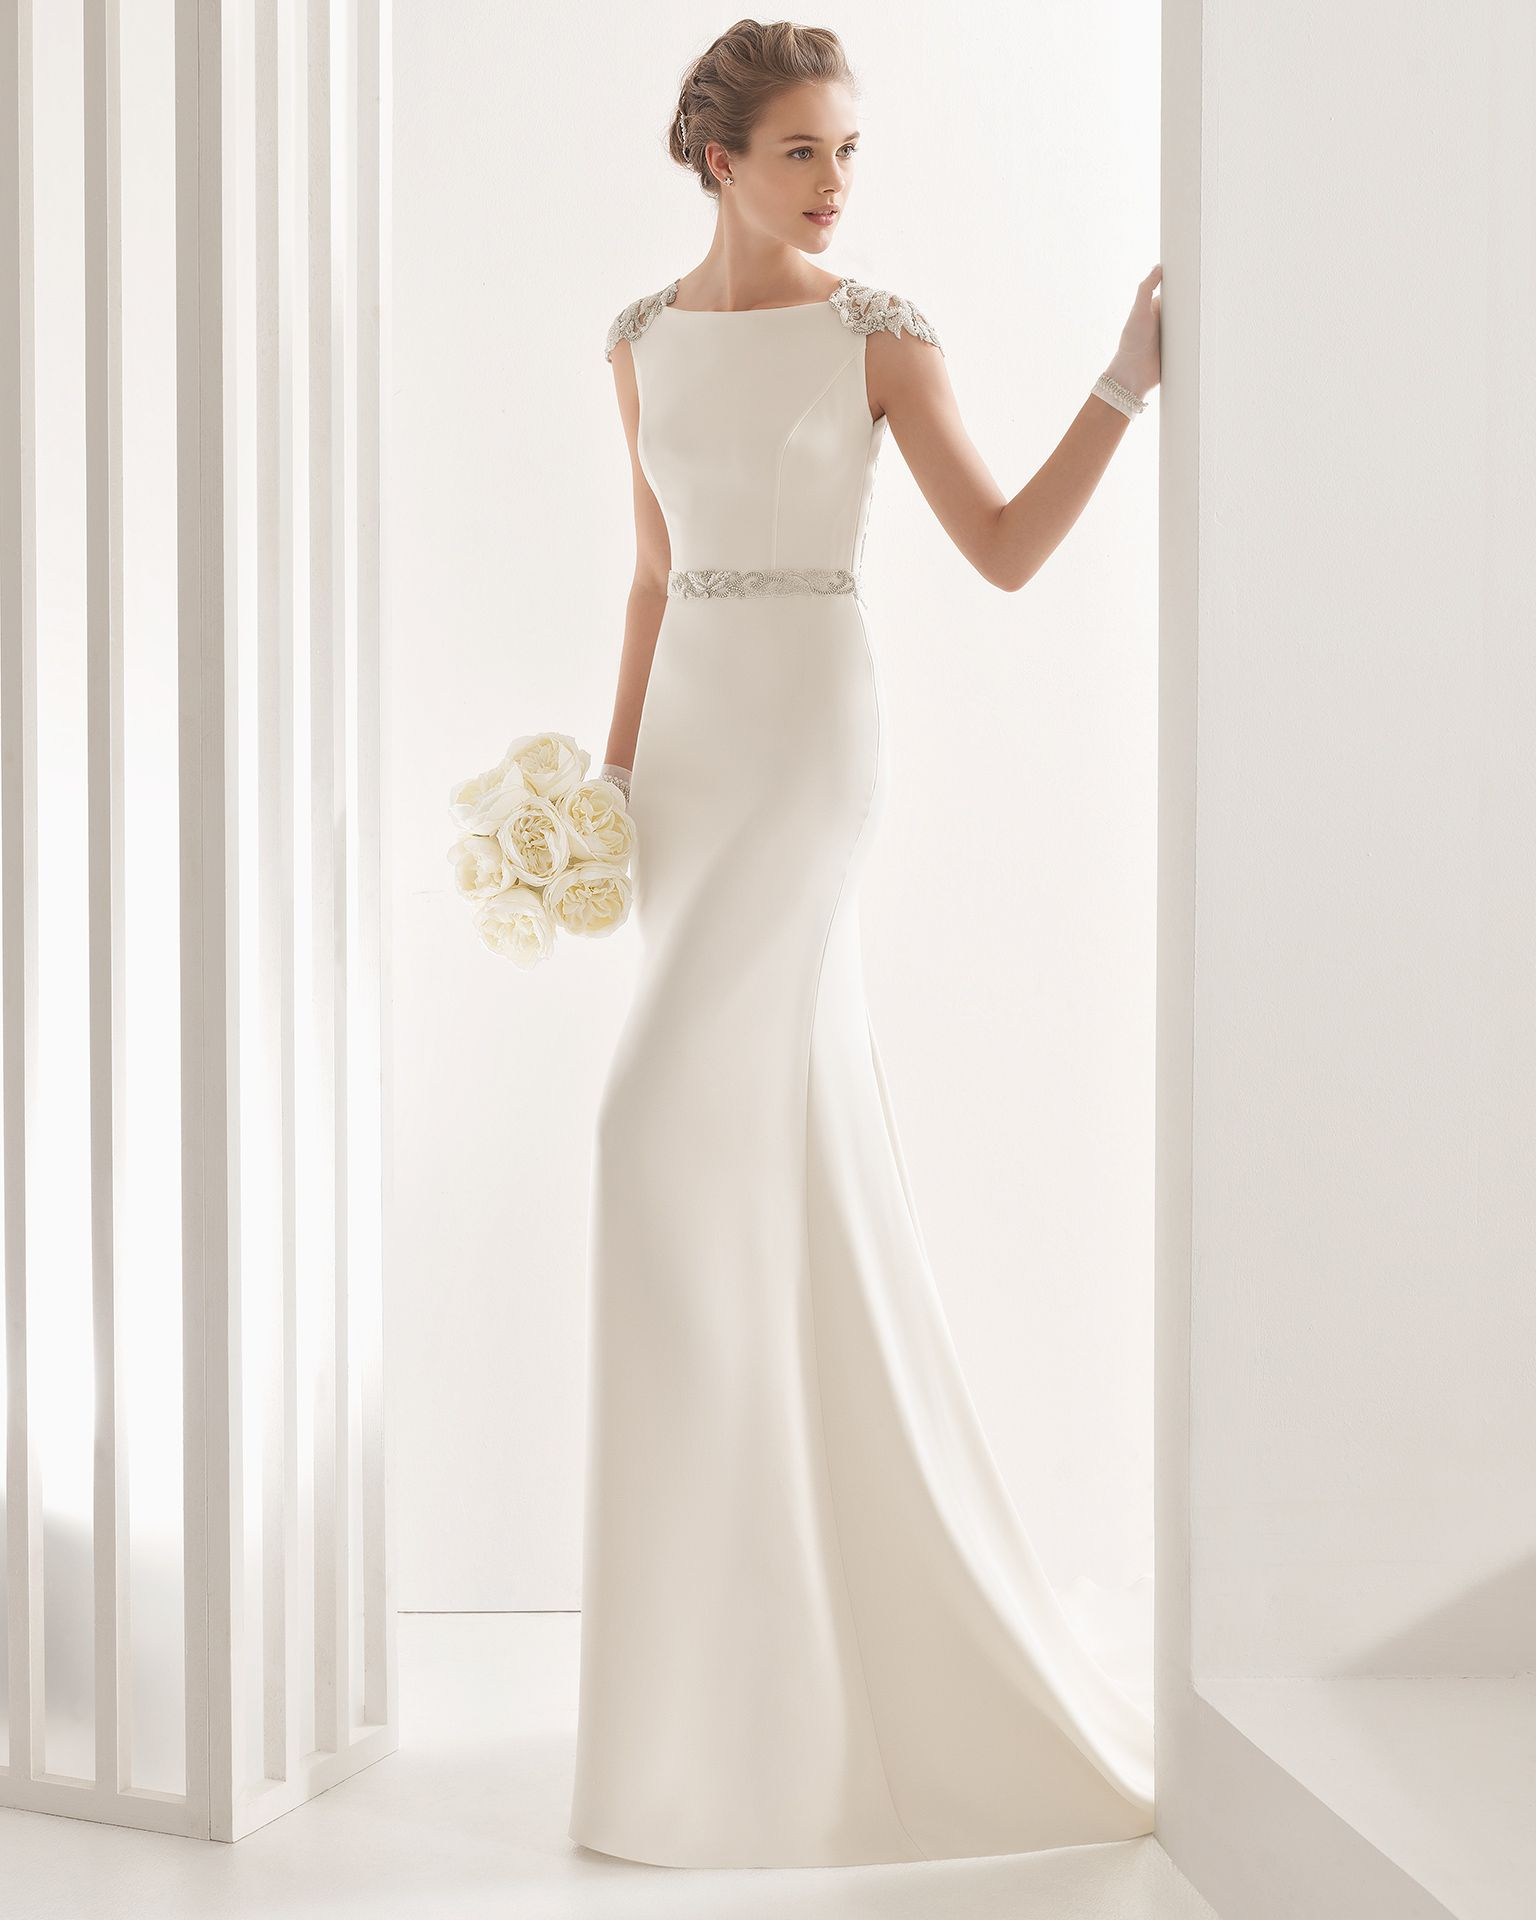 Naira - 2017 Bridal Collection. Rosa Clará. | Pinterest | Wedding ...